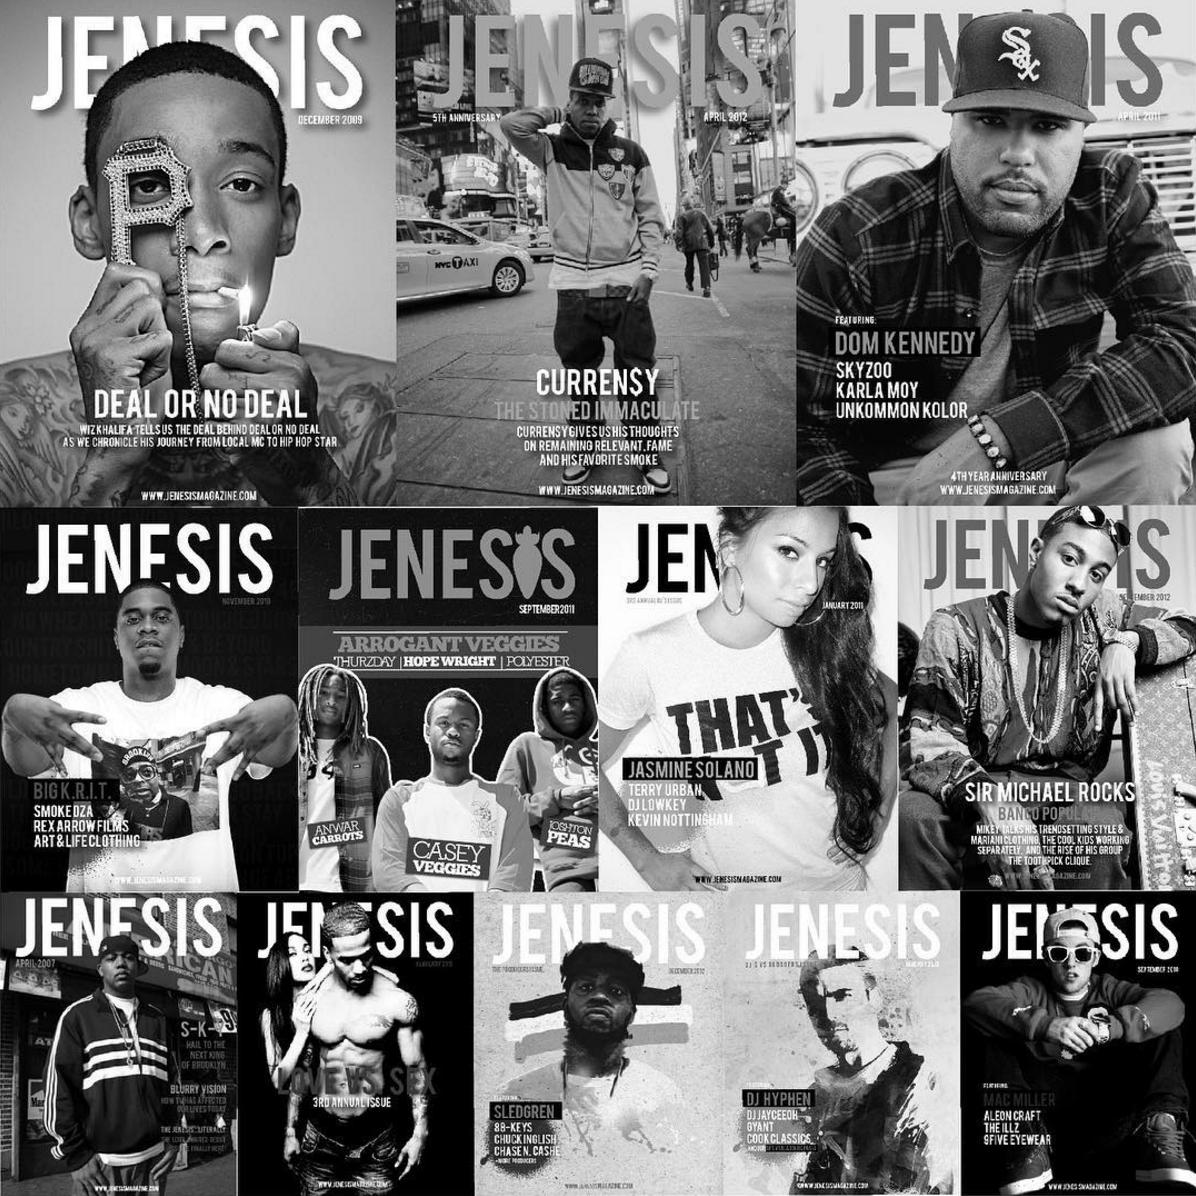 Jenesis Magazine covers